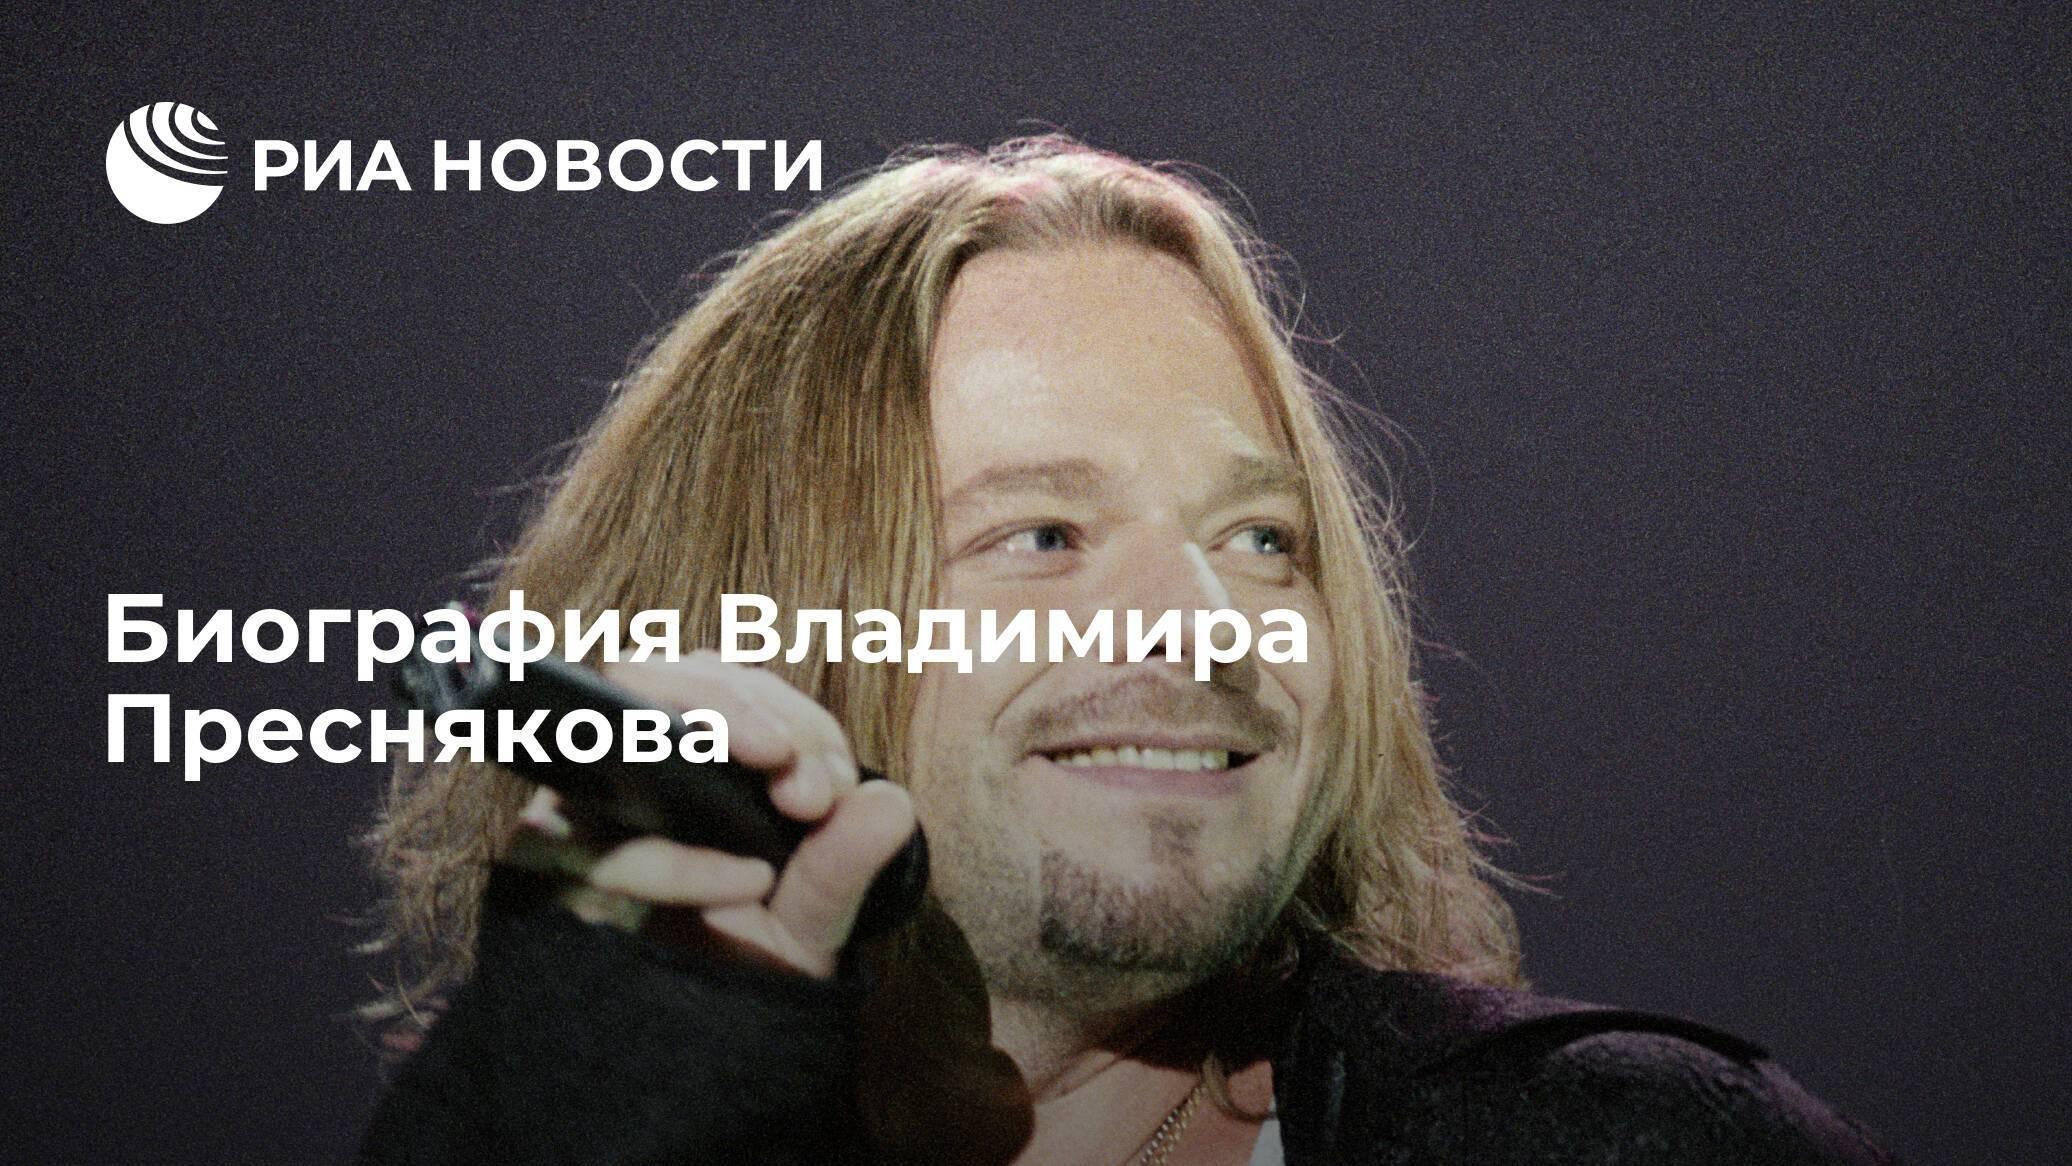 Пресняковвладимирпетрович